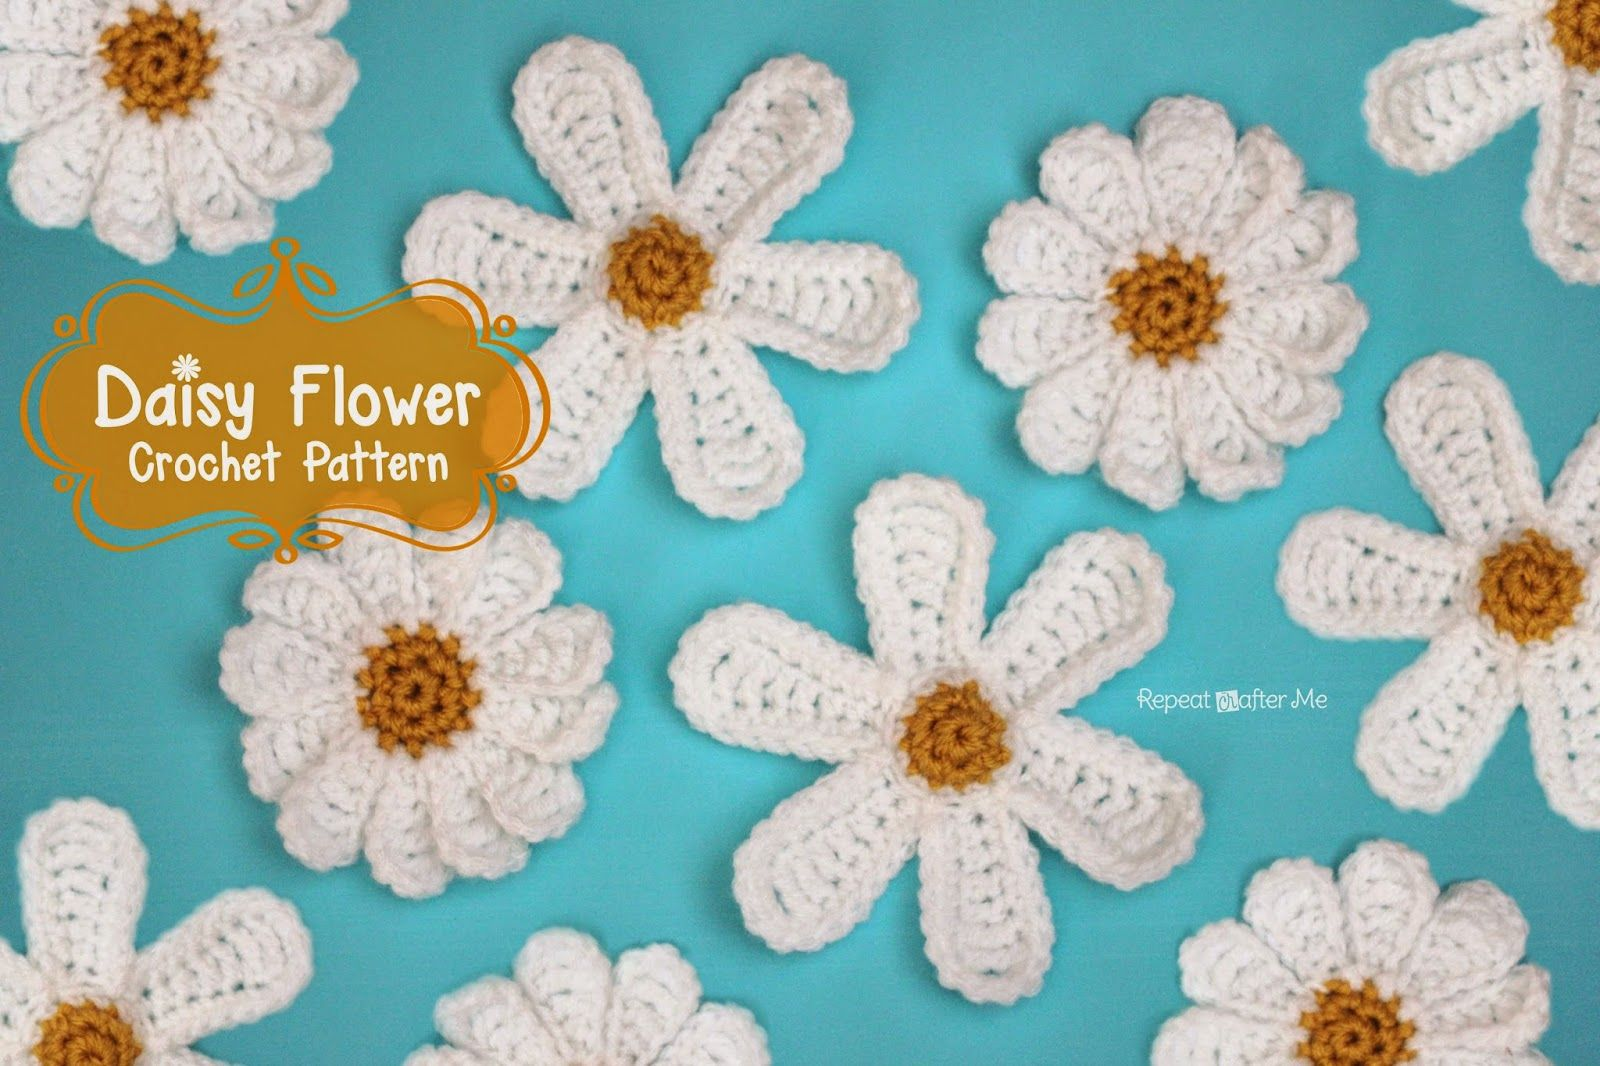 Daisy flower crochet pattern flower crochet crochet and flower daisy flower crochet pattern repeat crafter me izmirmasajfo